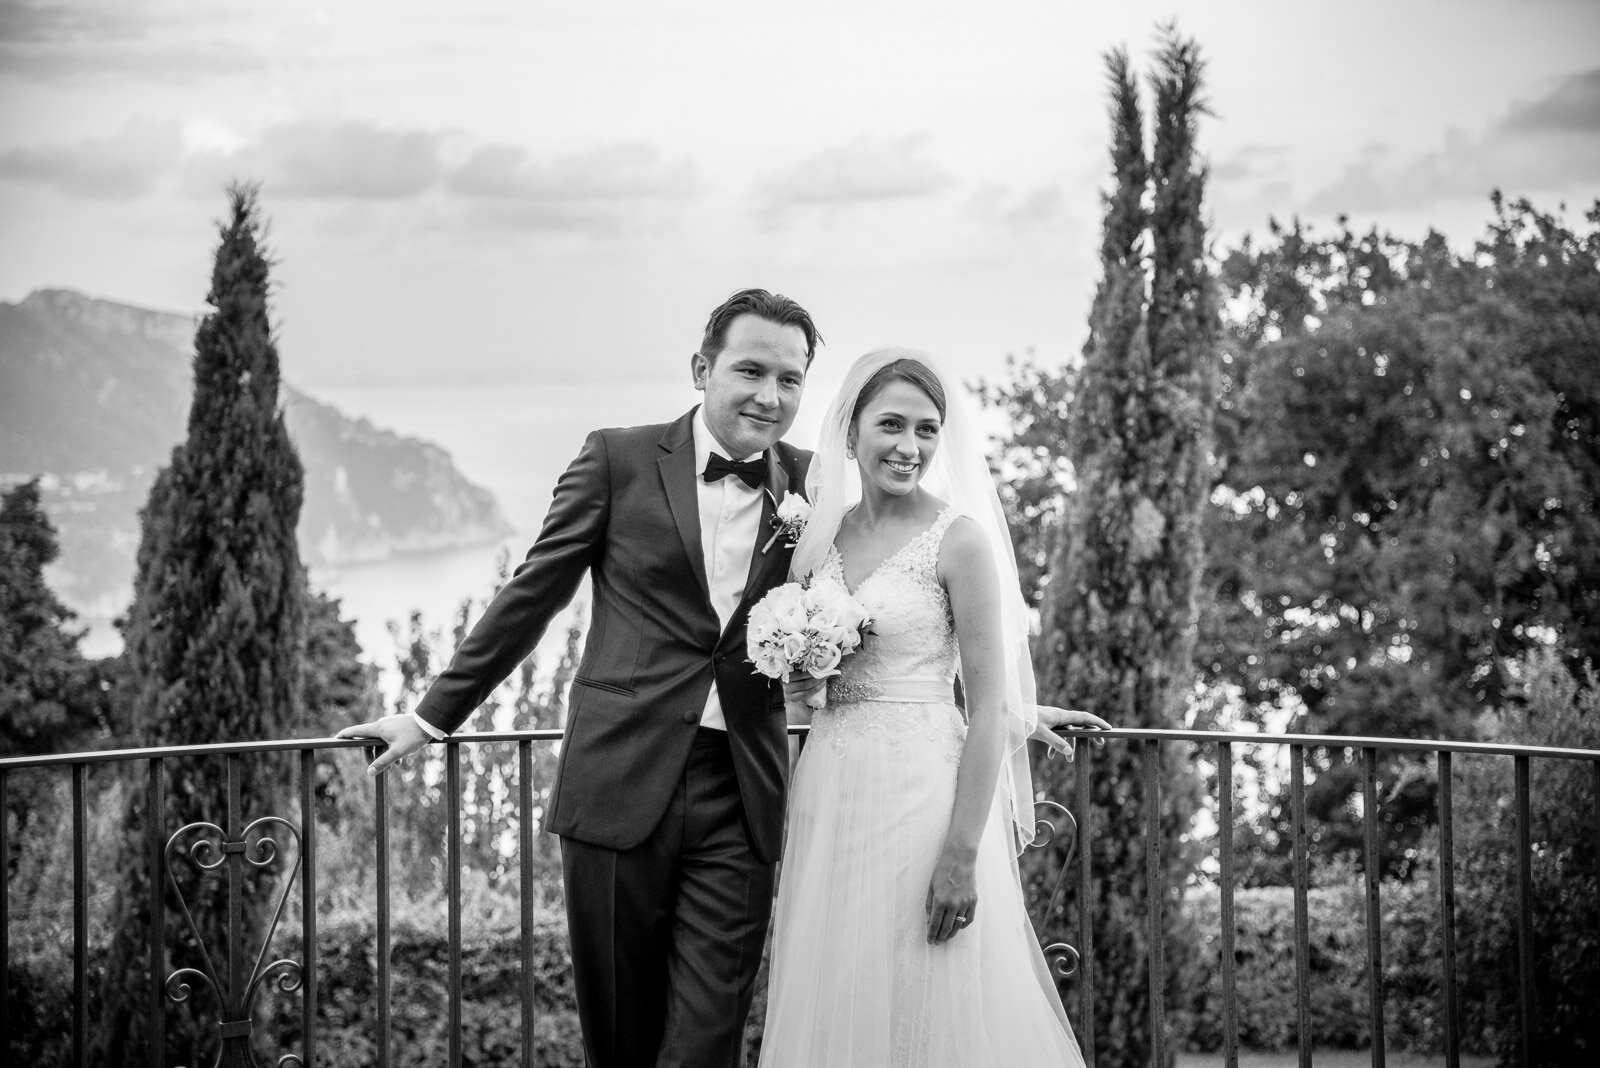 Russian Wedding in Villa Cimbrone Costiera Amalfitana 21.jpg